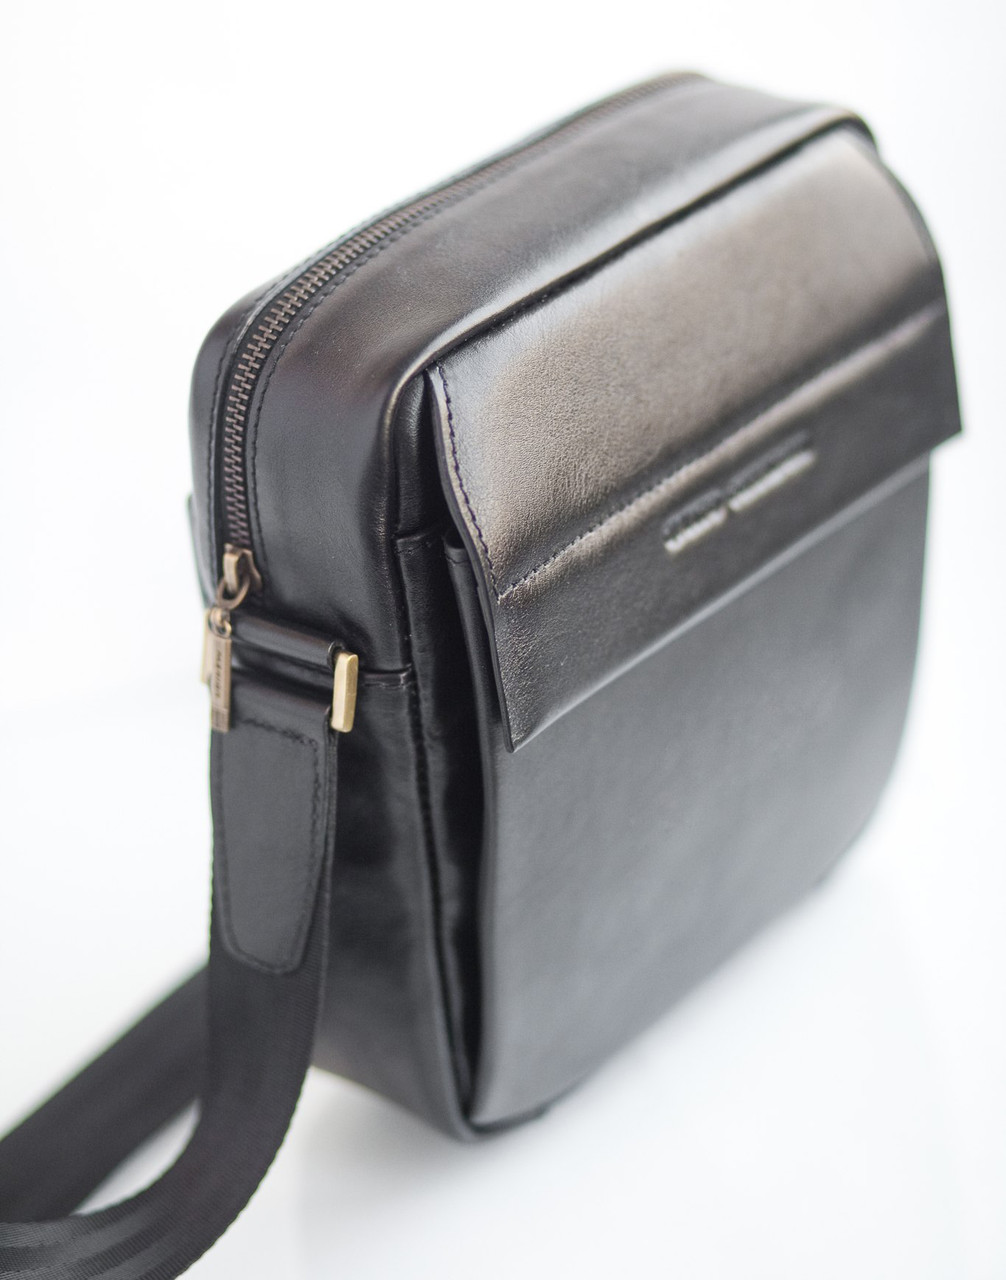 27a923771f4d Мужская кожаная сумка-мессенджер Qvinto Corridoni QC101A - Интернет-магазин  сумок